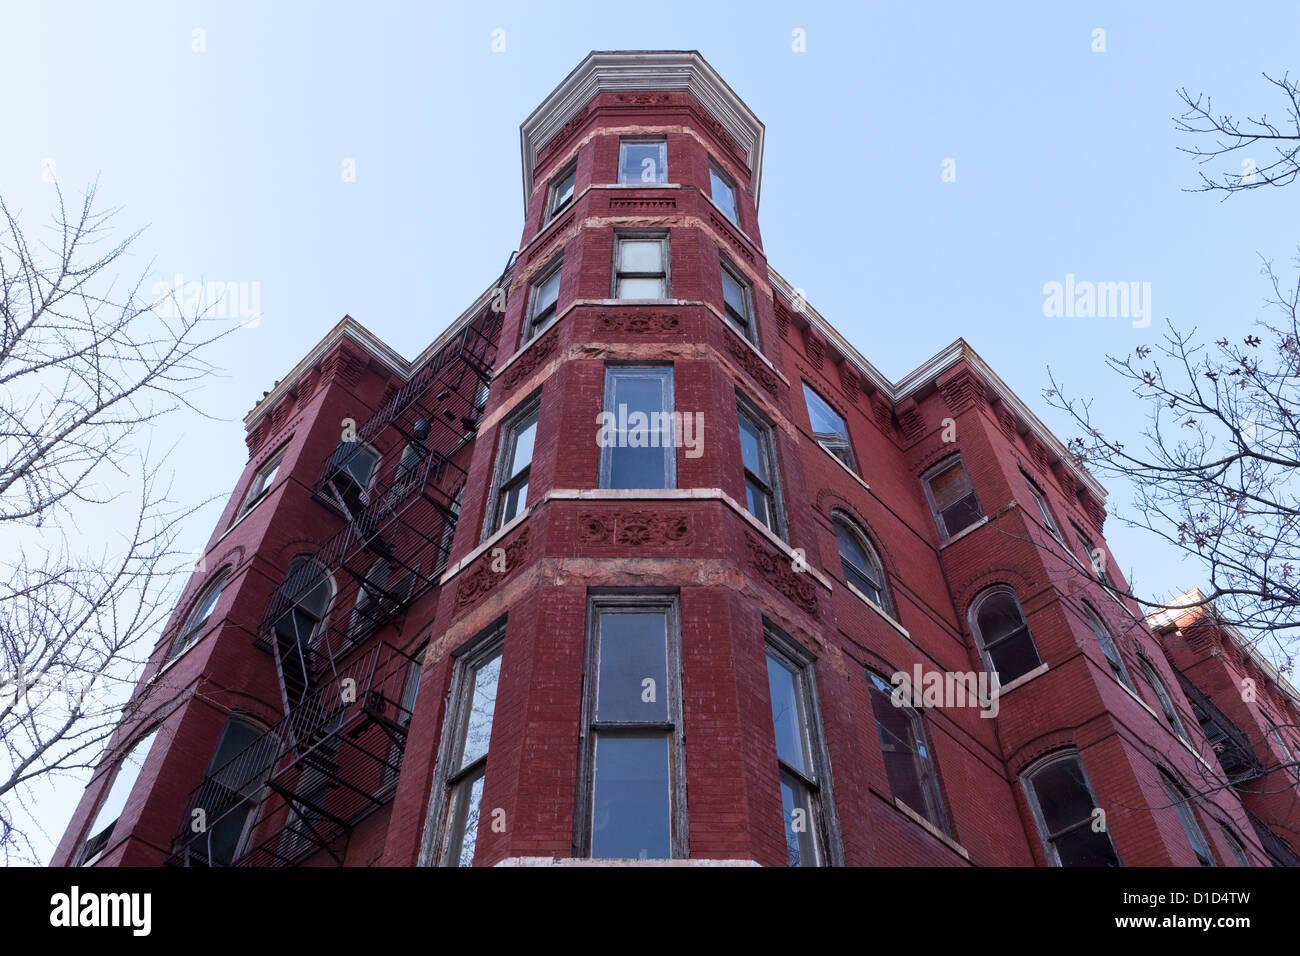 Corner turret of brick building - Stock Image